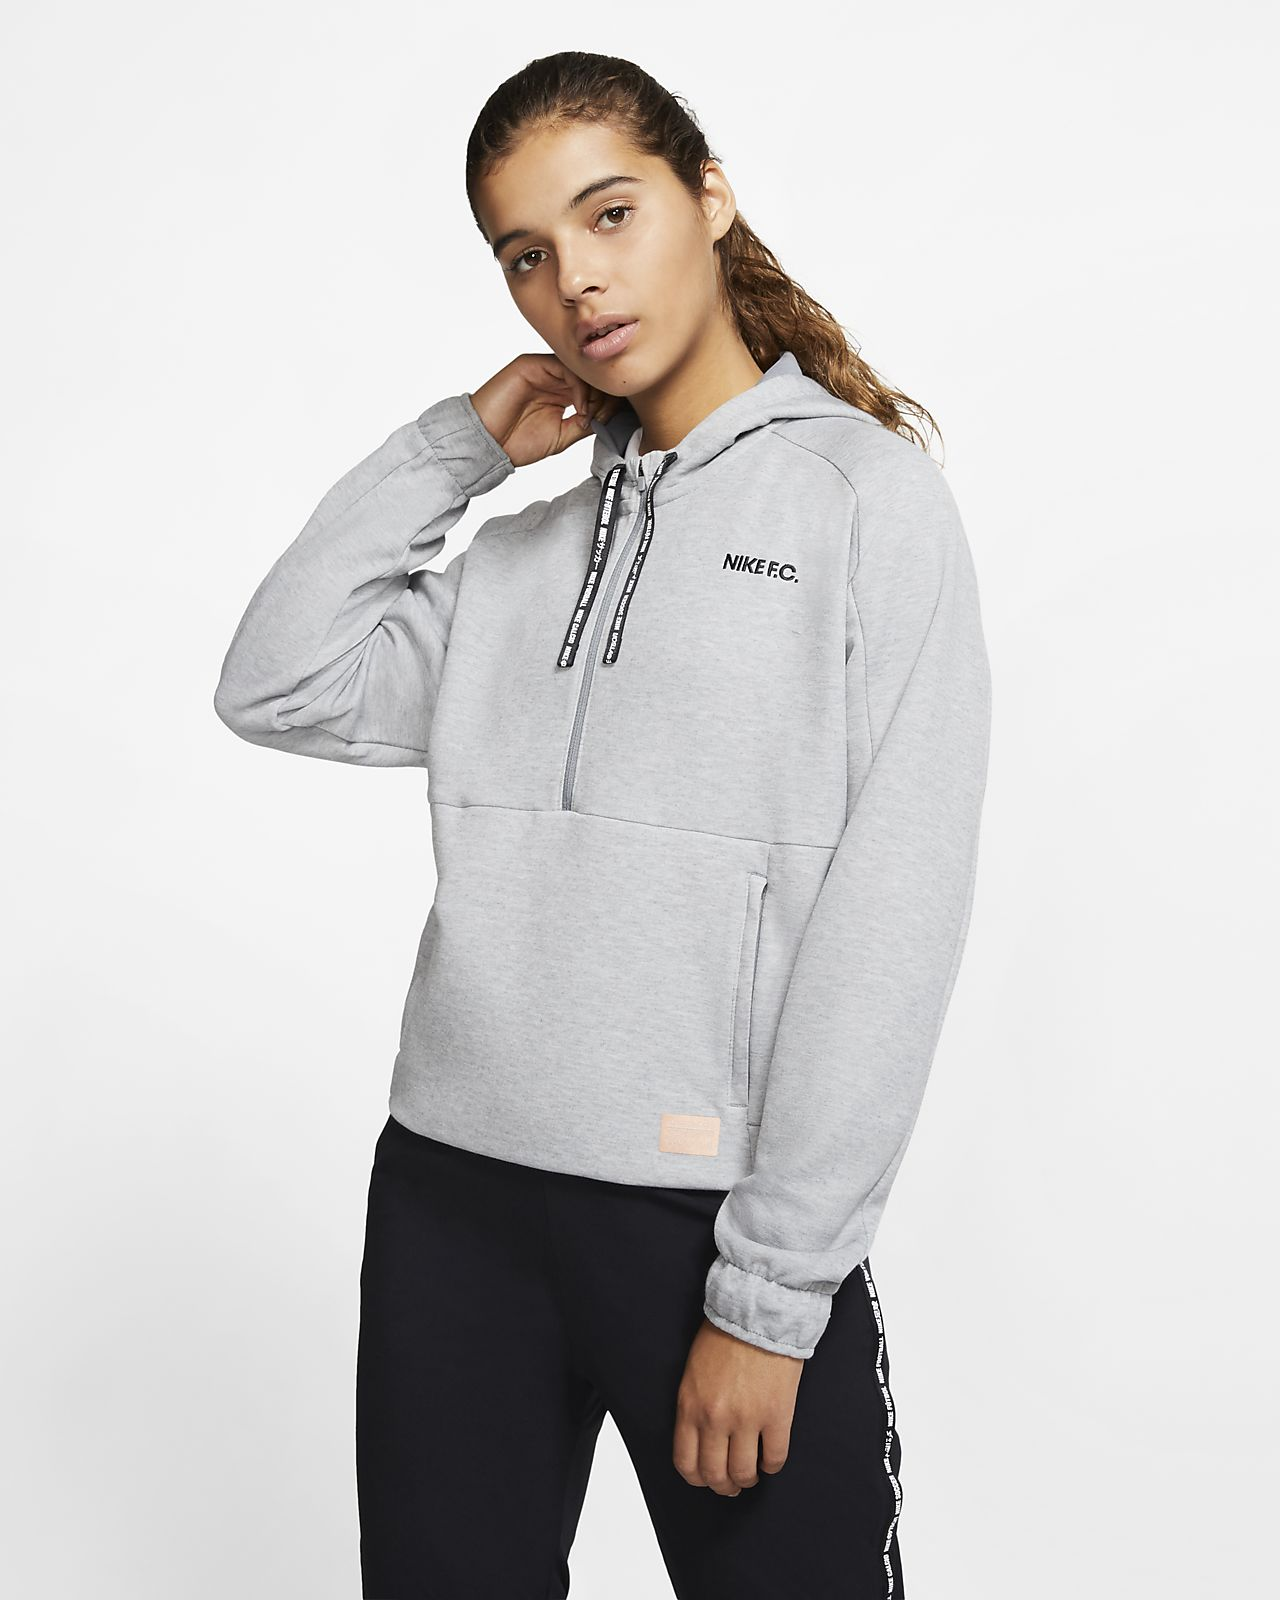 Nike F.C. Dri-FIT rövid cipzáras női kapucnis pulóver futballhoz